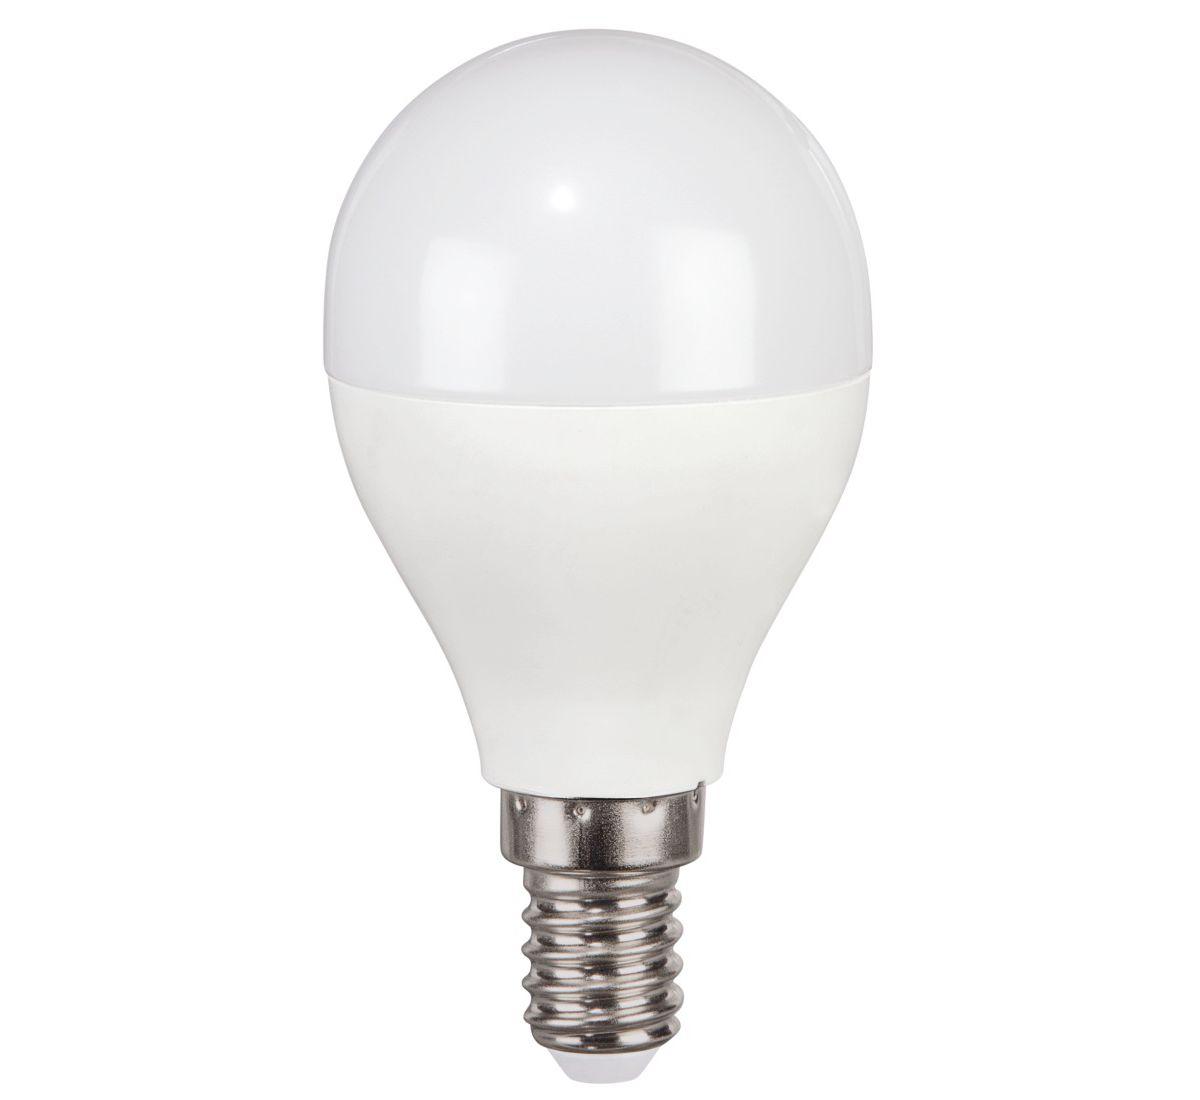 Xavax LED-Lampe, E14, 530lm ersetzt 43W, Tropfe...